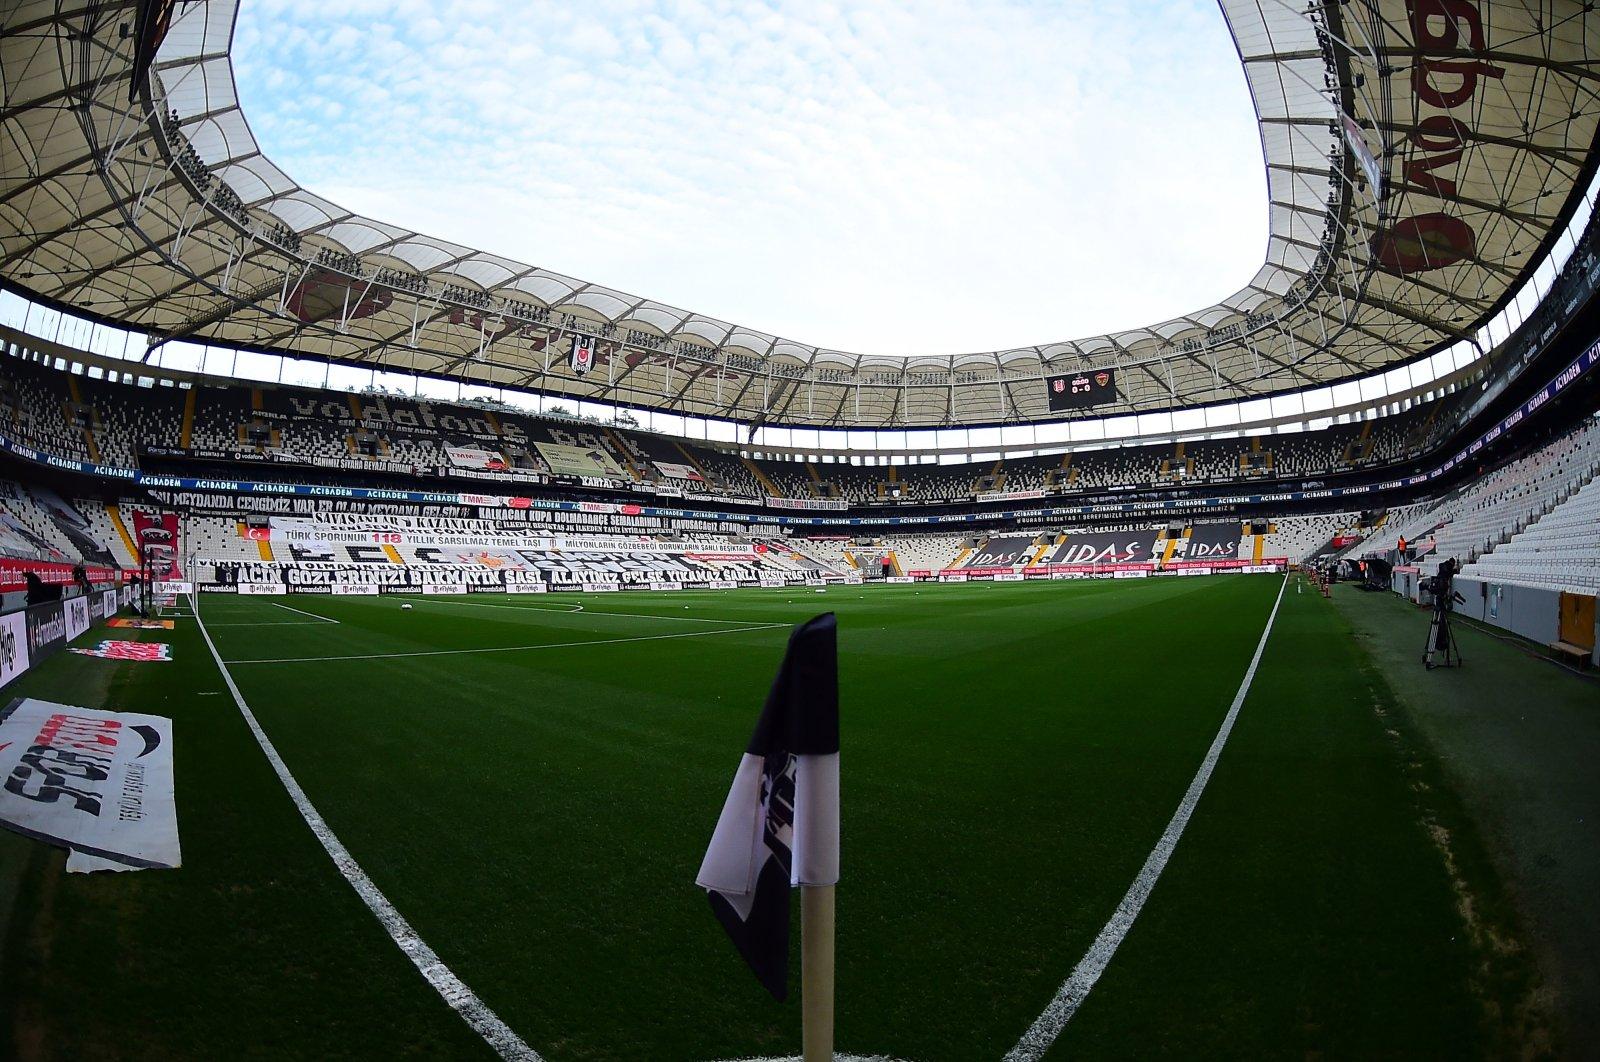 A general view of Vodafone Park, the home of Süper Lig champion Beşiktaş, Istanbul, Turkey, May 1, 2021. (Turgut Doğan/Sabah Photo)